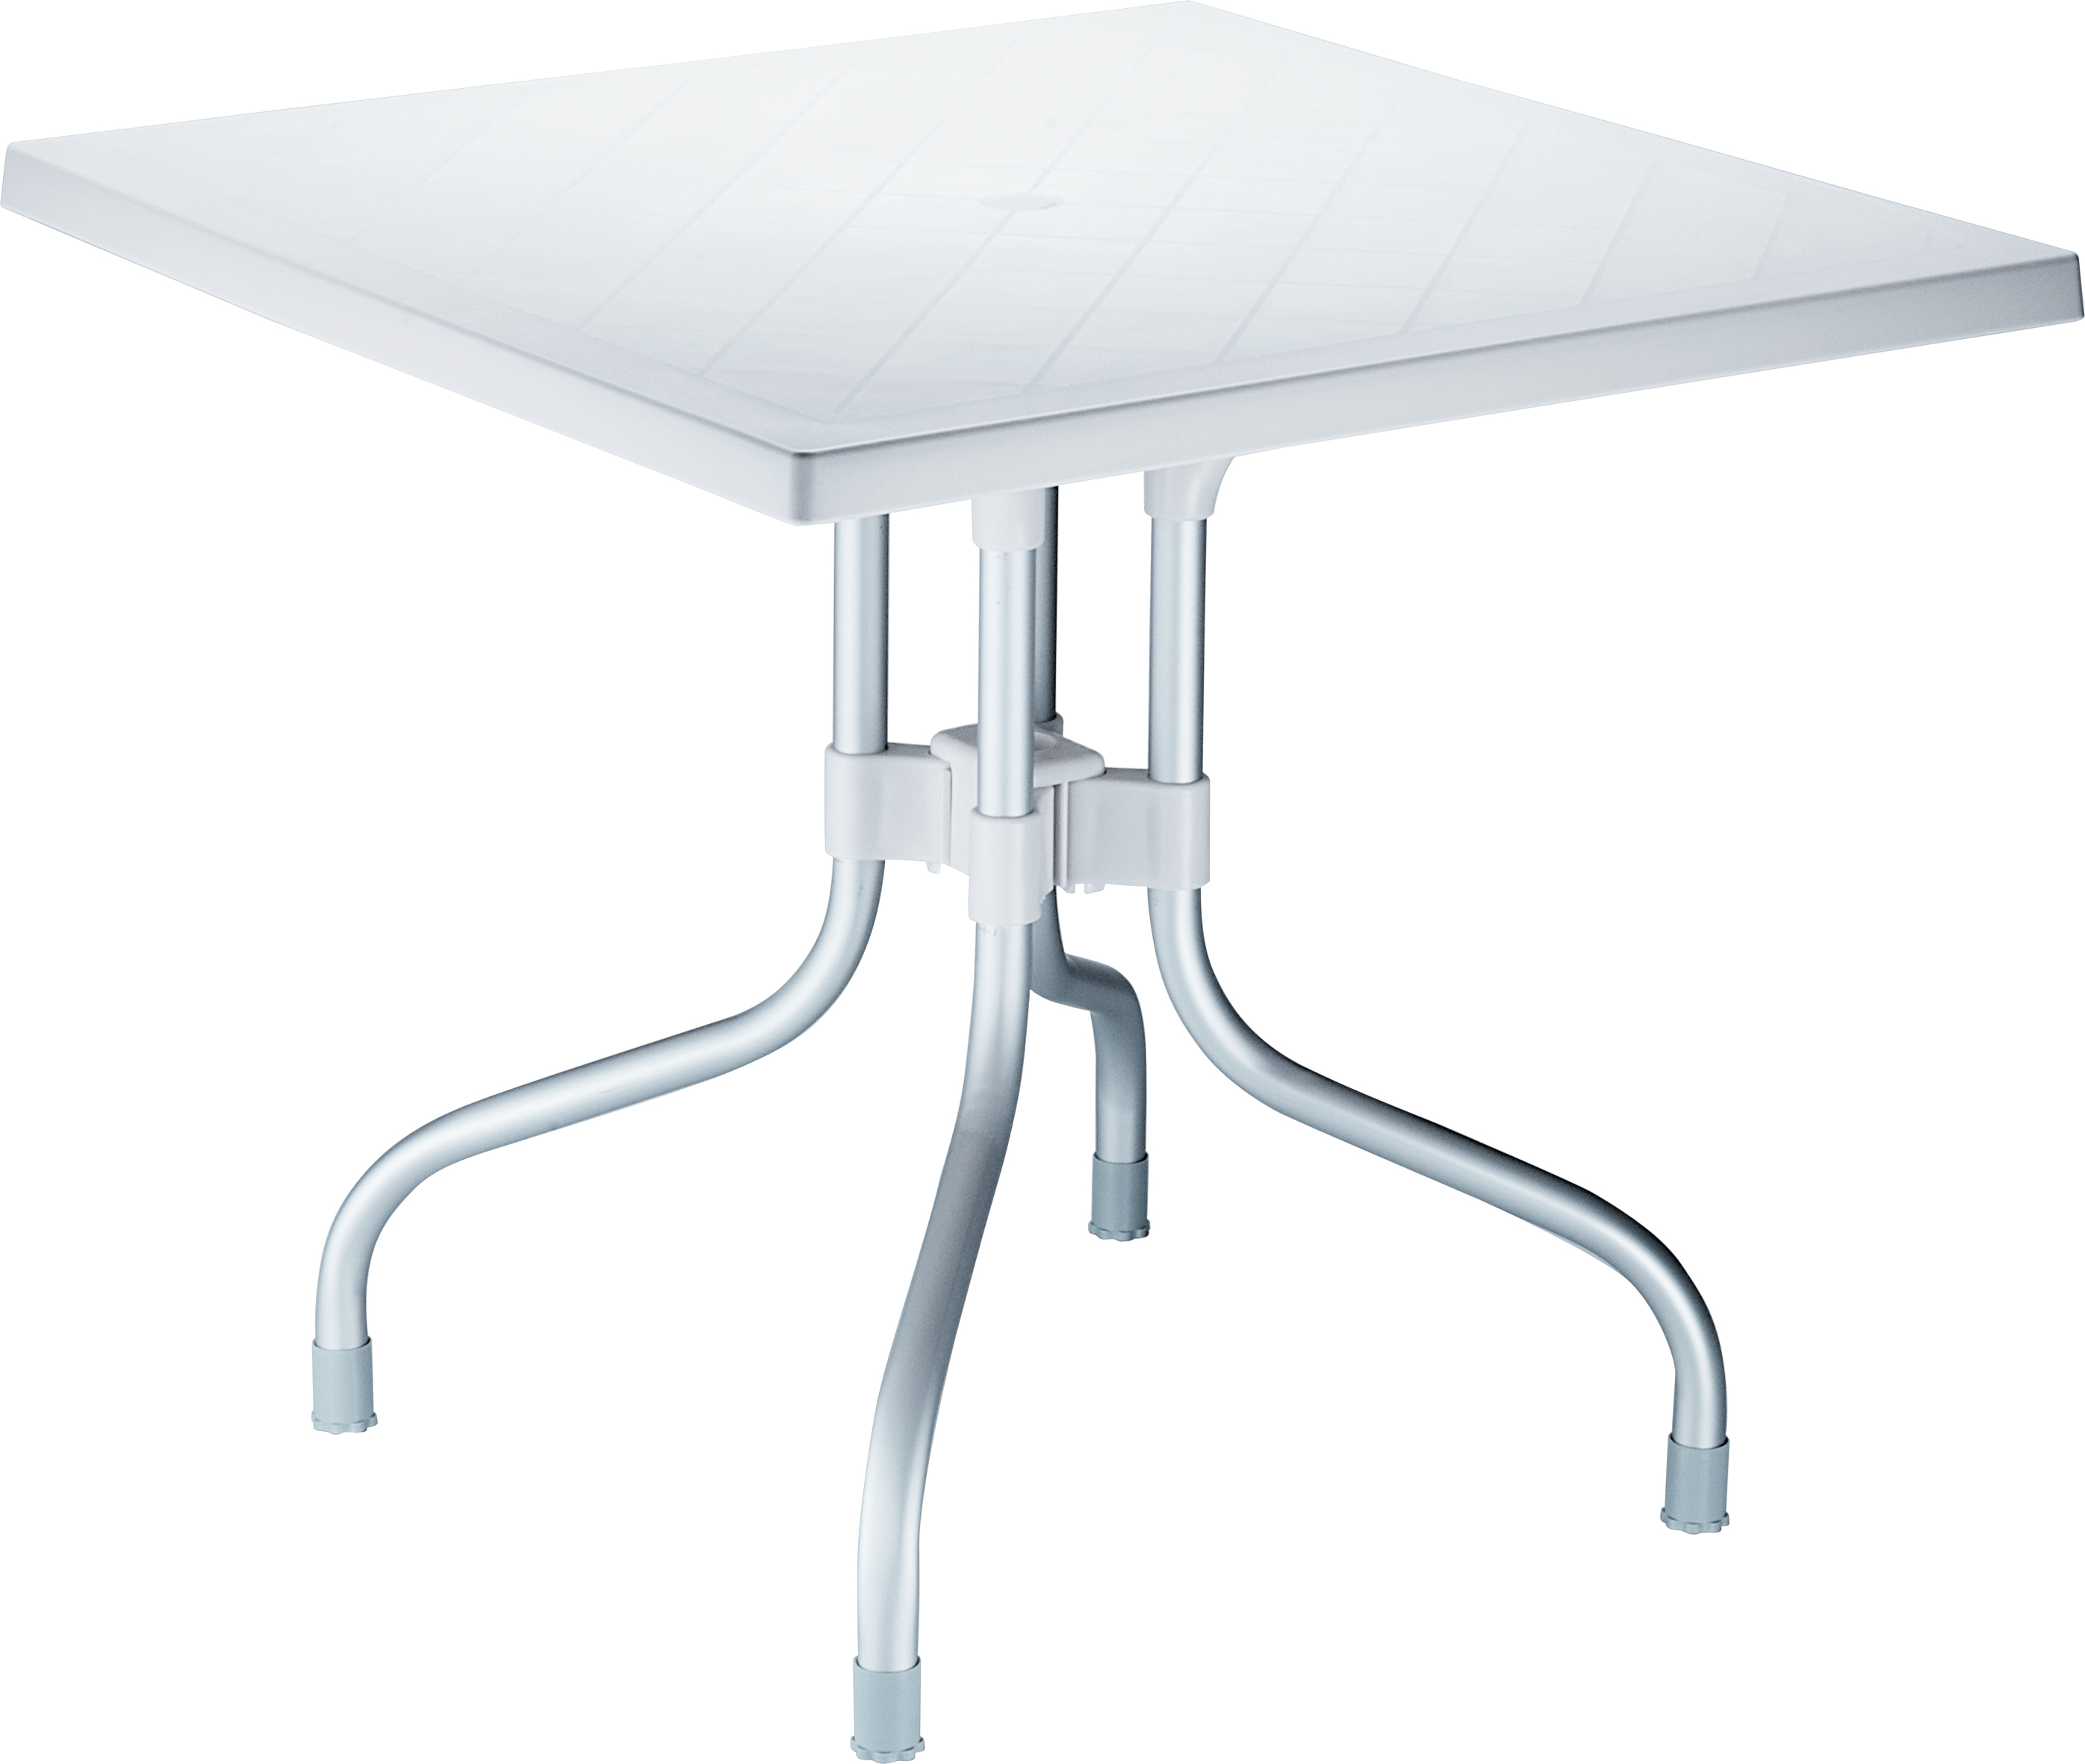 Str collectie tafels tafels en bistrotafels forza for Inklapbare tafel